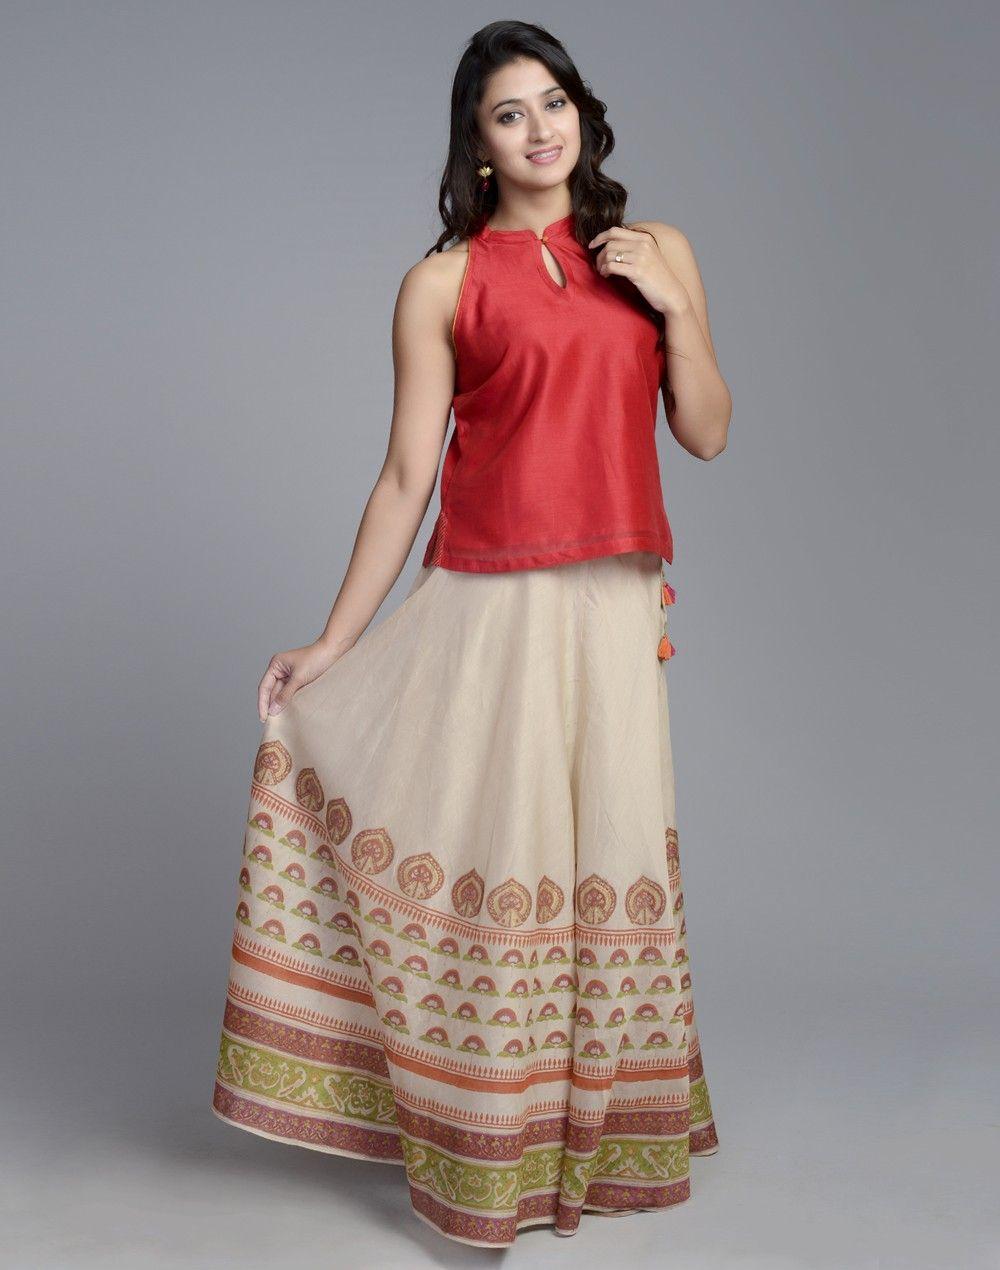 975de5c37d Silk Cotton Printed Skirt Set   ◇ Stylista : Salwars/ churidars n ...